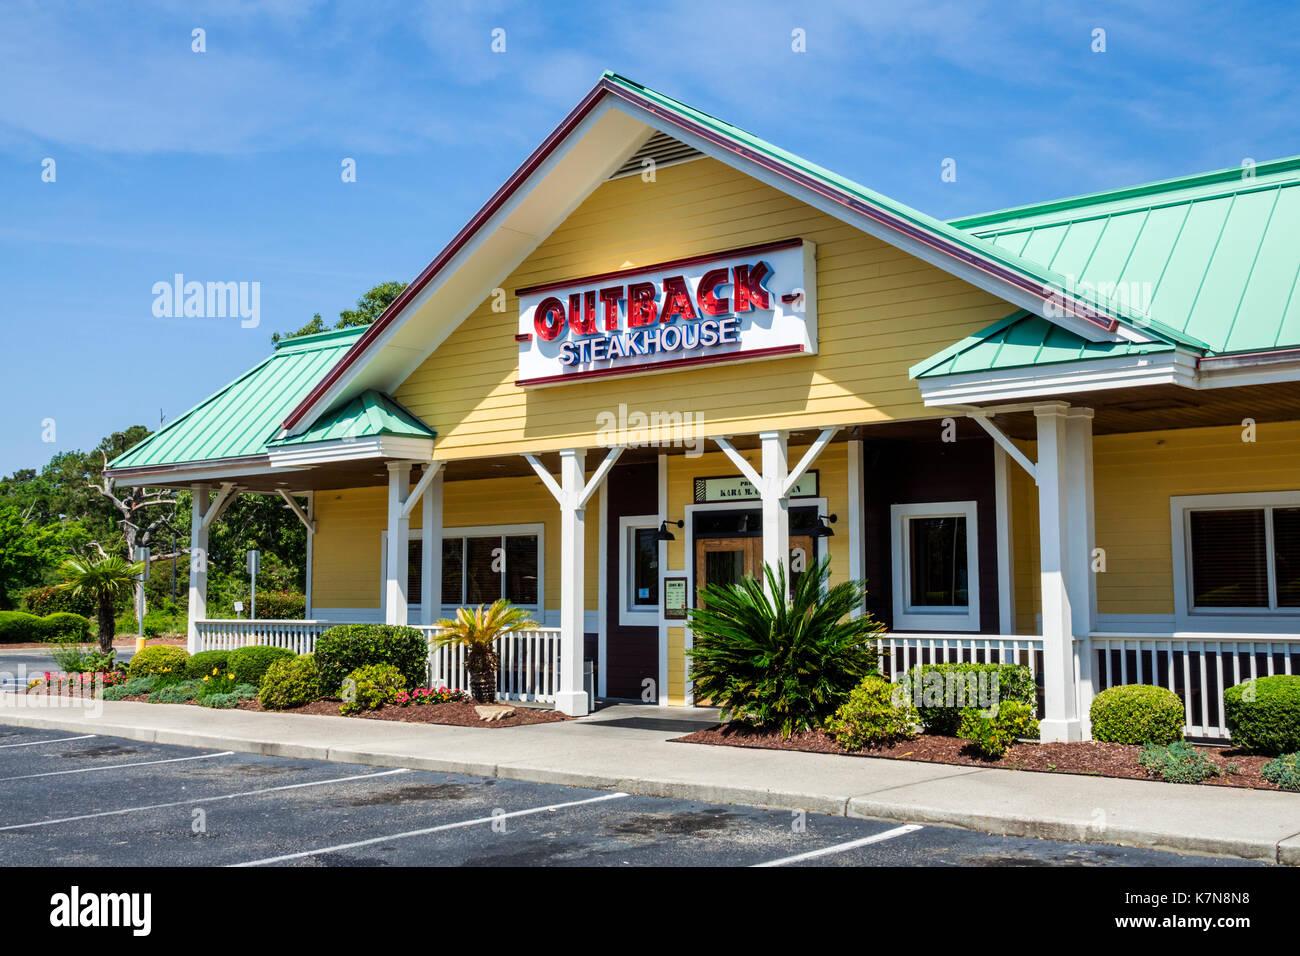 Myrtle Beach South Carolina SC Outback Steakhouse restaurant building exterior parking empty - Stock Image